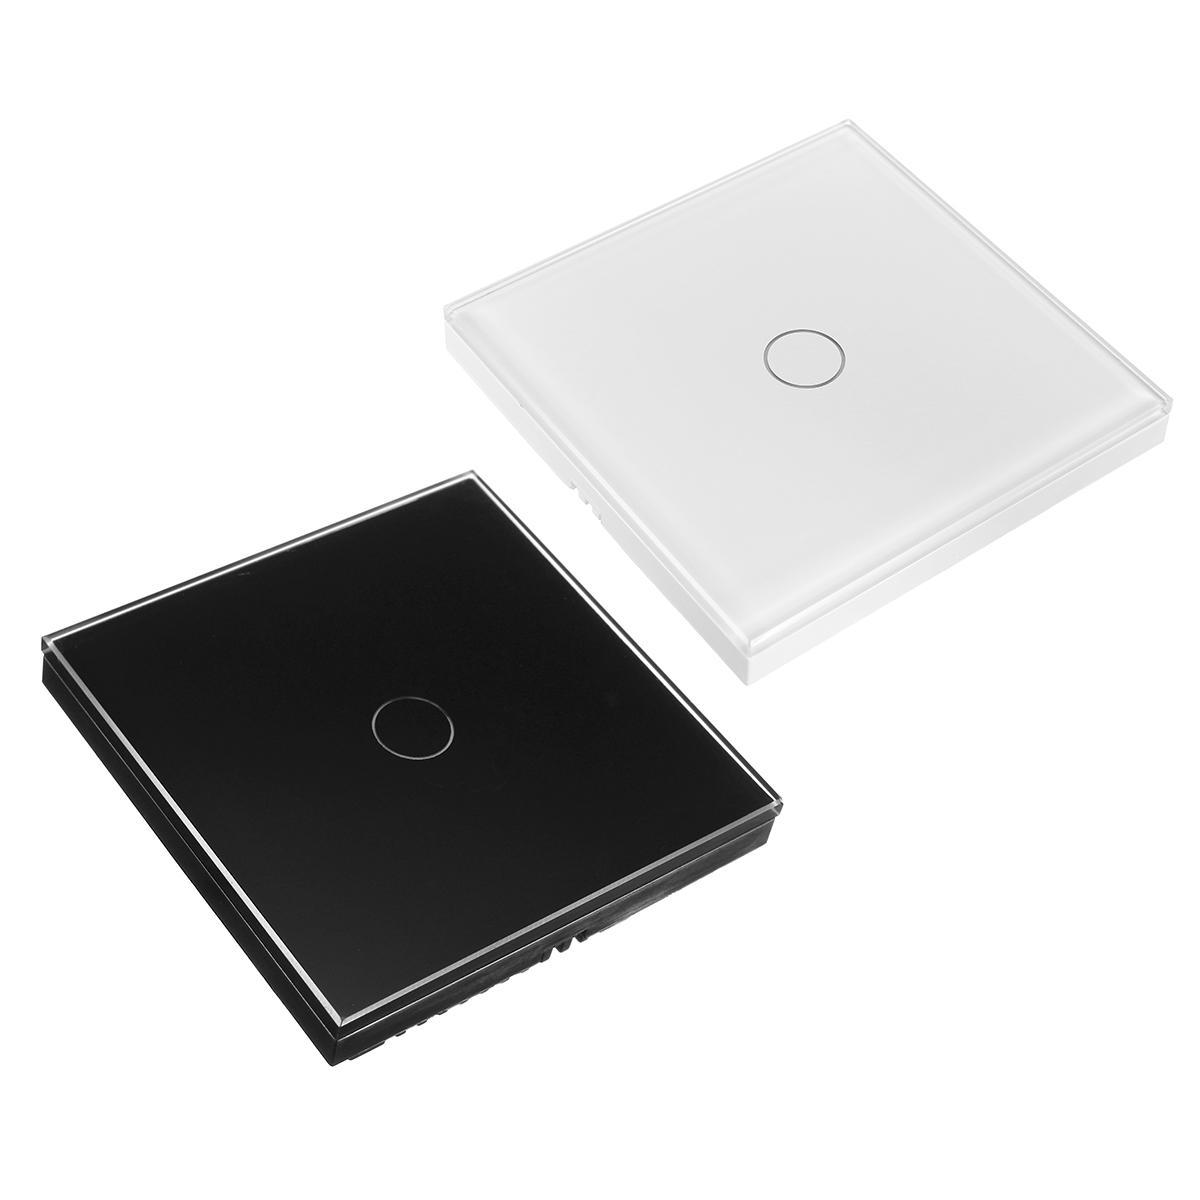 1 Gang 1 Interrupteur Mural Télécommande WIFI Smart Light Touch Pour Amazon Alexa